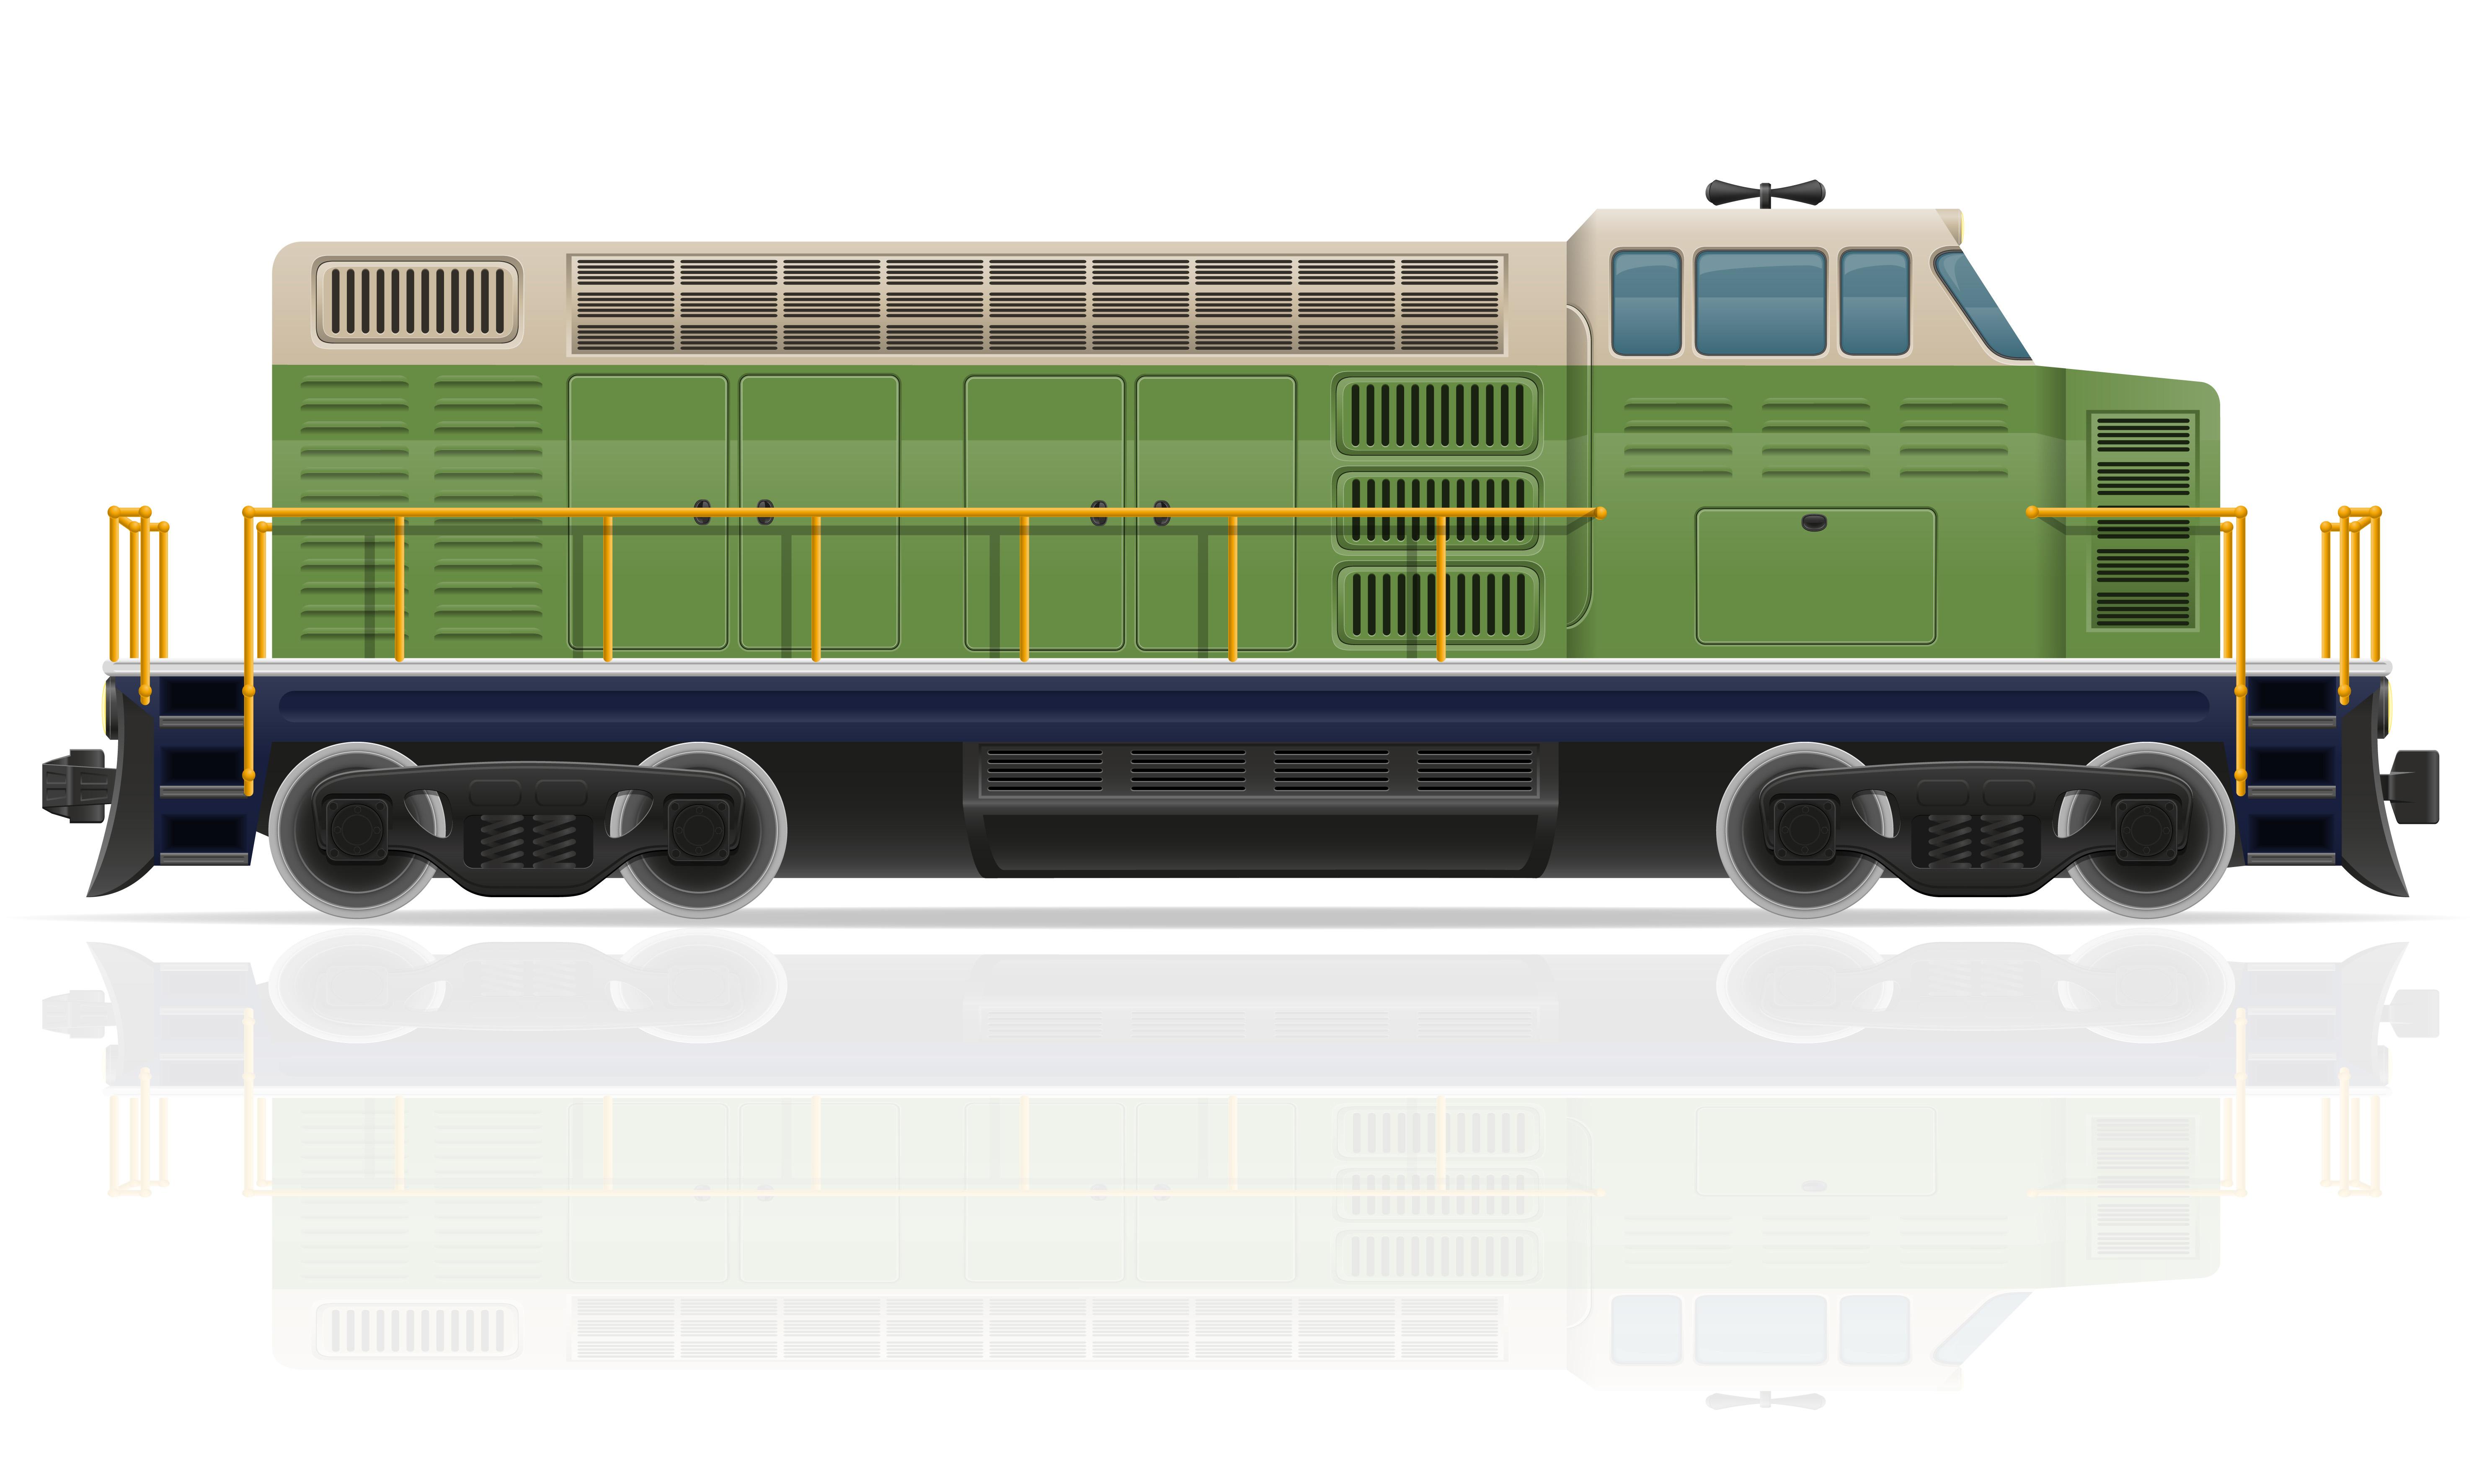 railway locomotive train vector illustration - Download ...